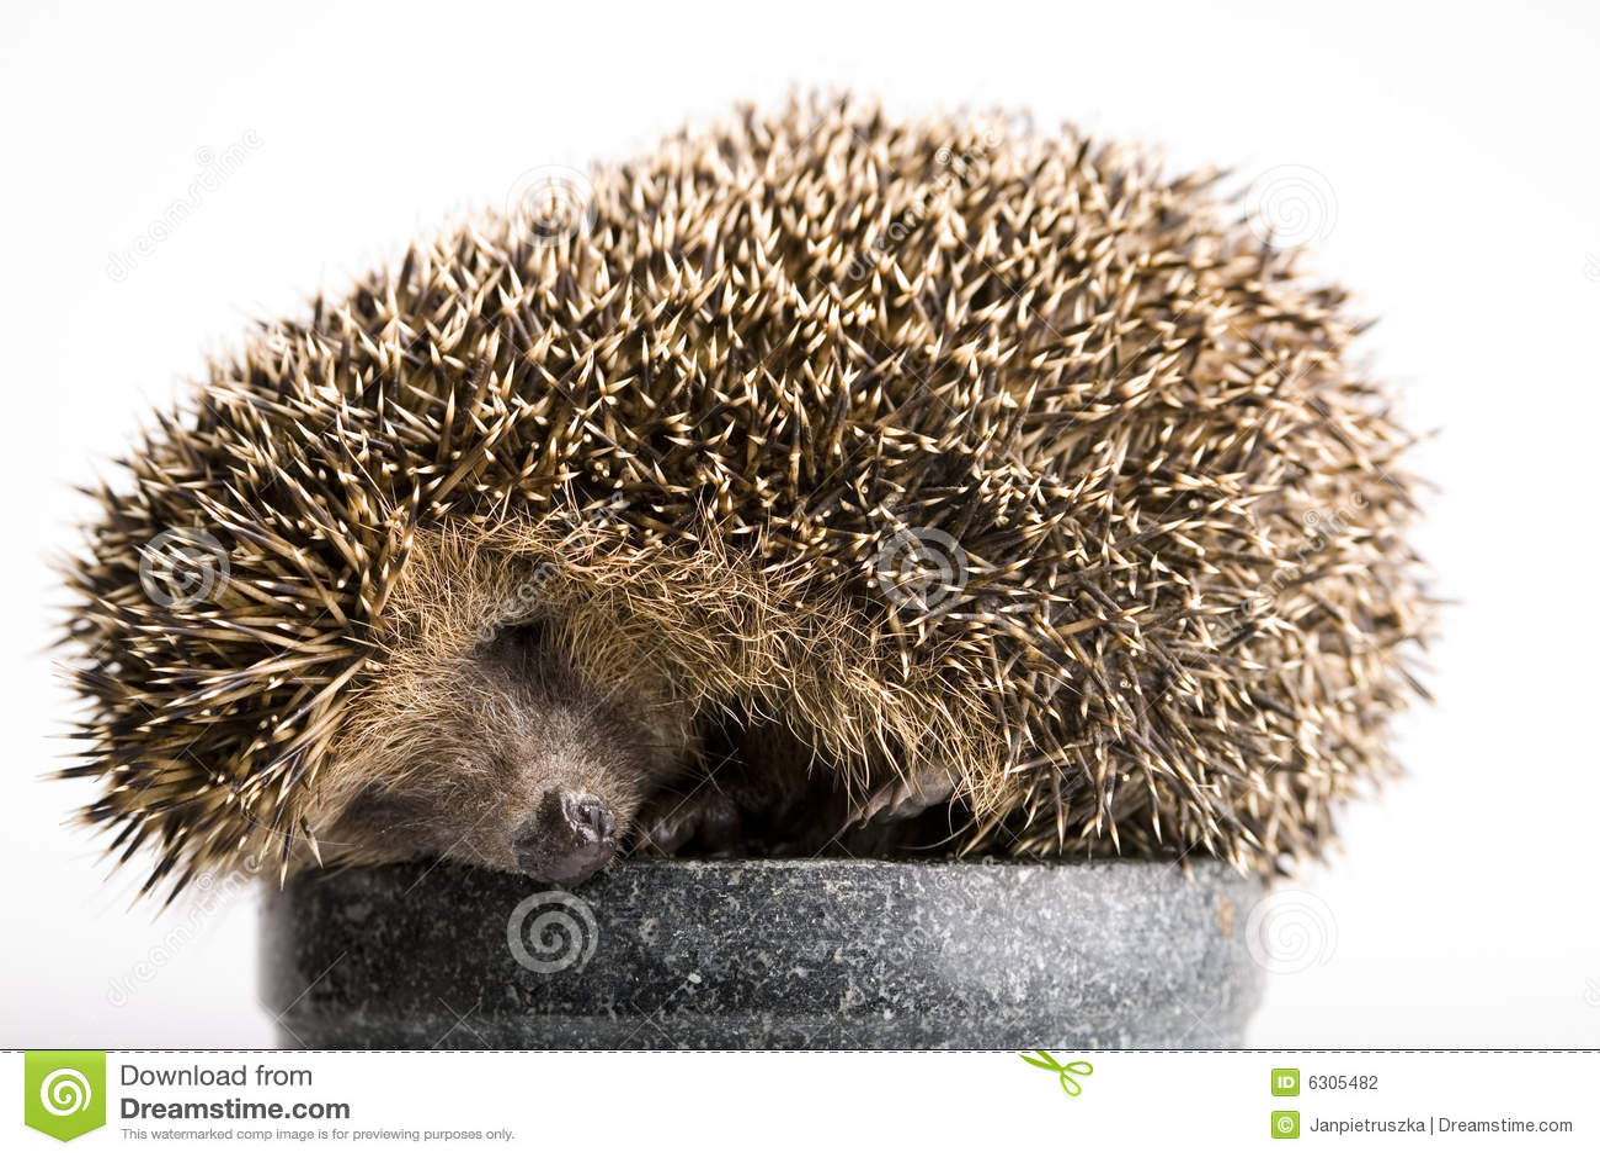 igel schlafen stockfoto bild von hedgehogs tier hedgehog 6305482. Black Bedroom Furniture Sets. Home Design Ideas